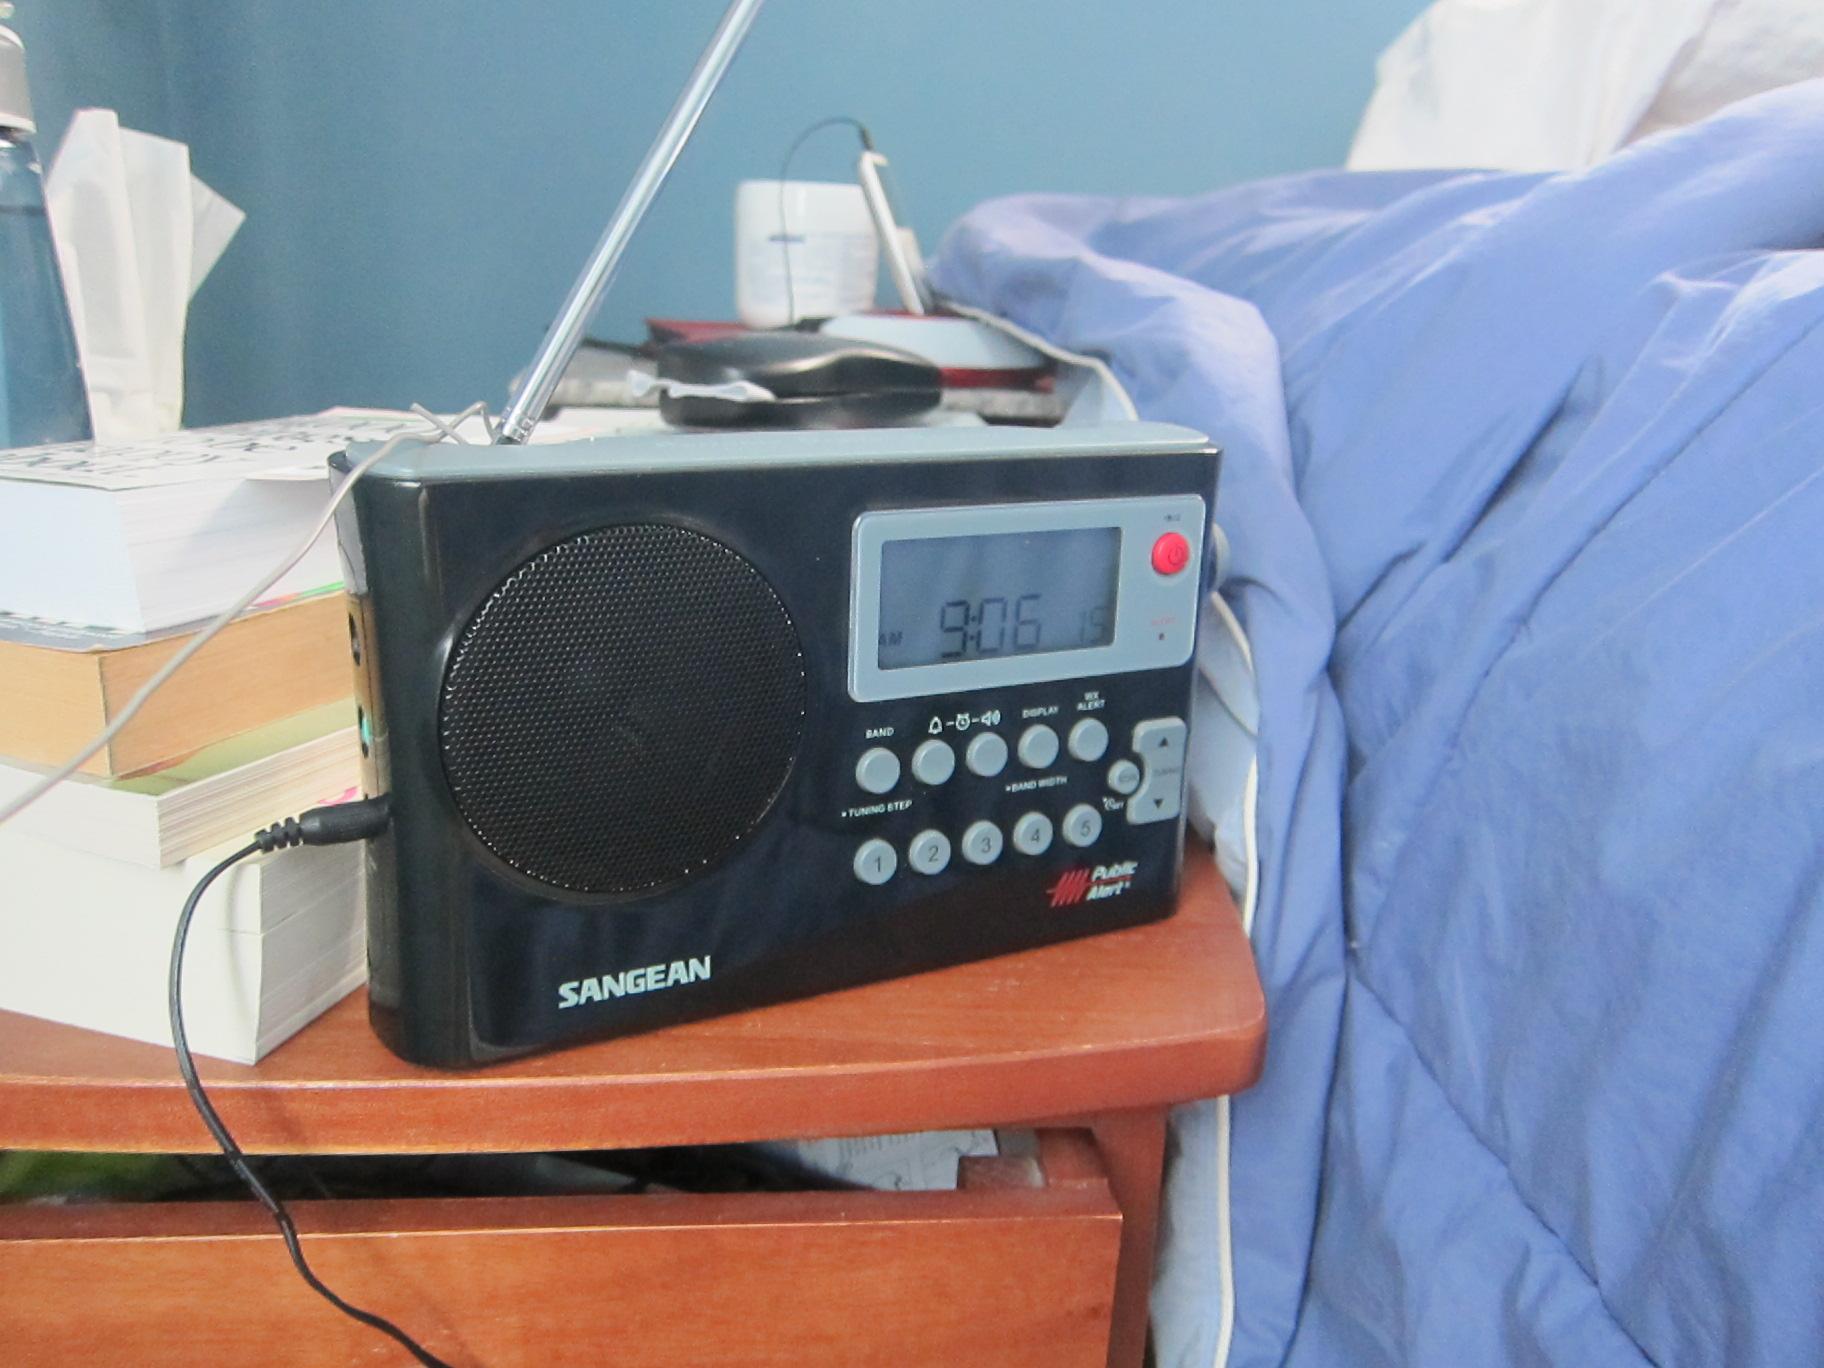 Herculodge: Sangean PR-D4W Review with FM Wire Antenna Upgrade